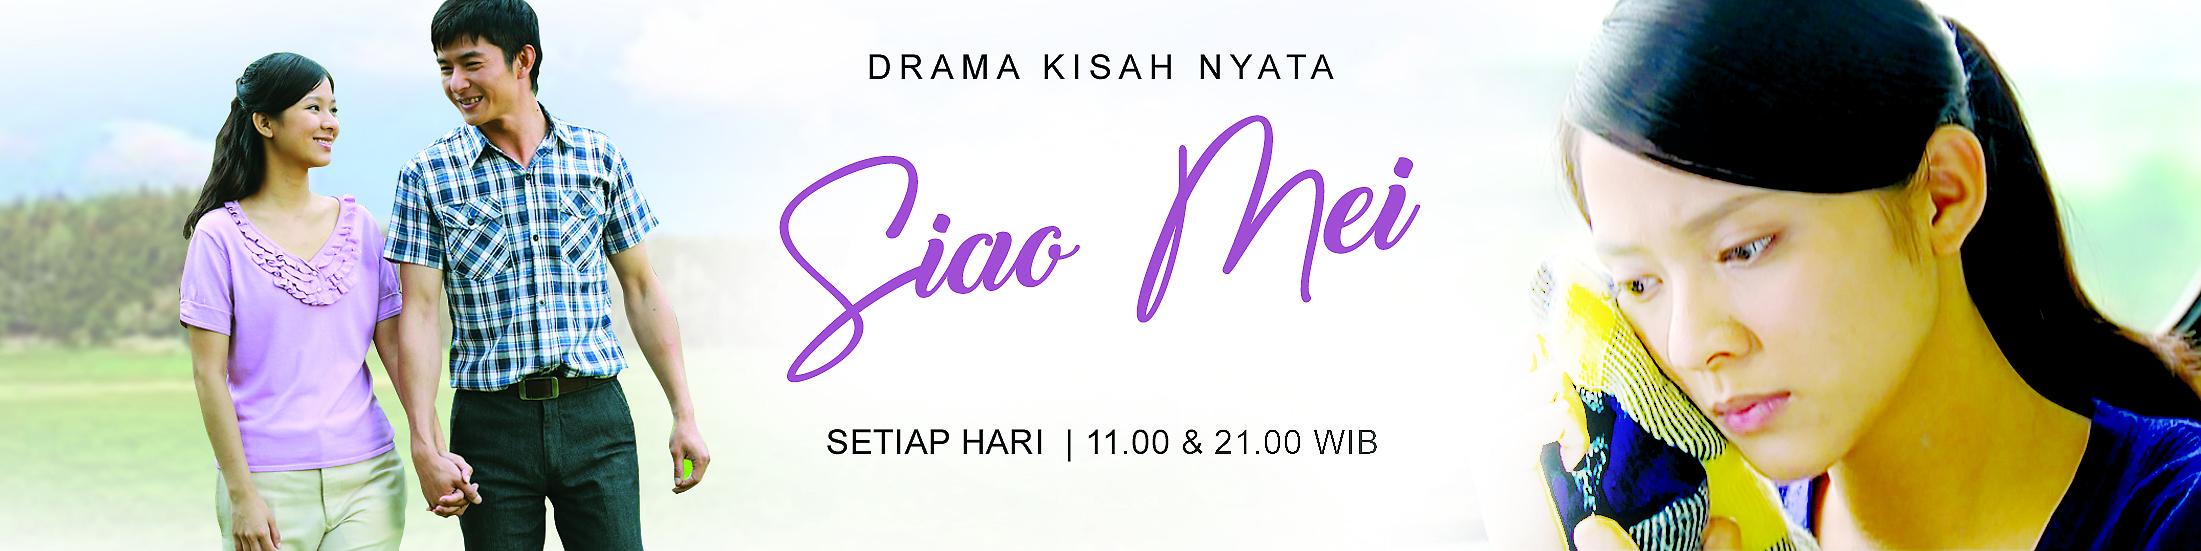 03. Siao Mei web banner